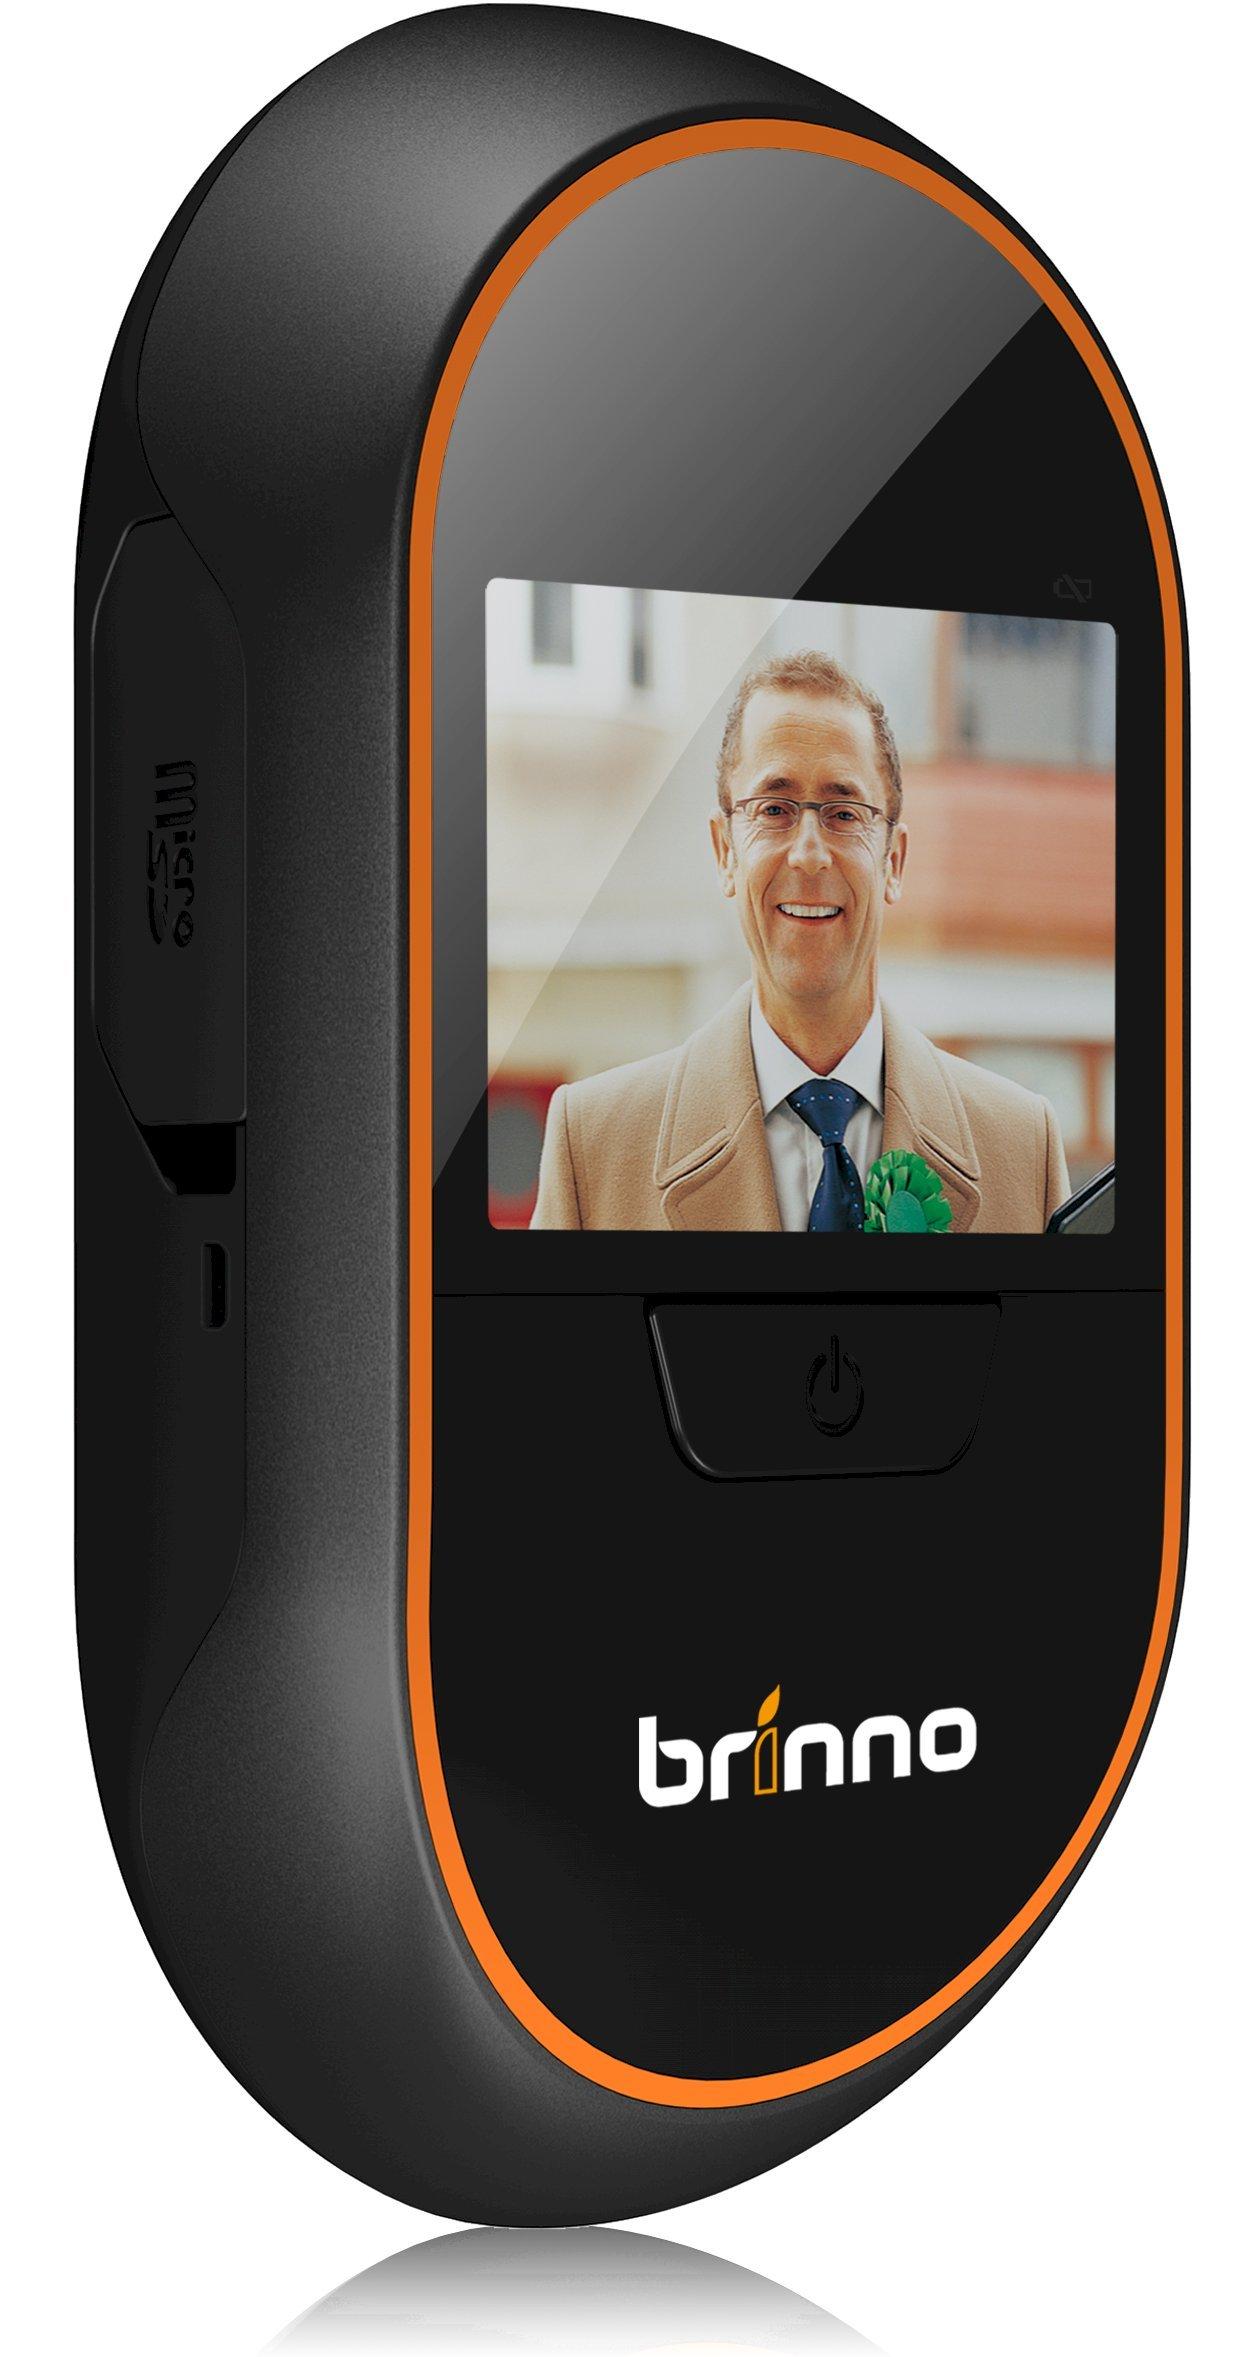 Brinno PHVMAC Motion Activated Hidden Front Door Camera